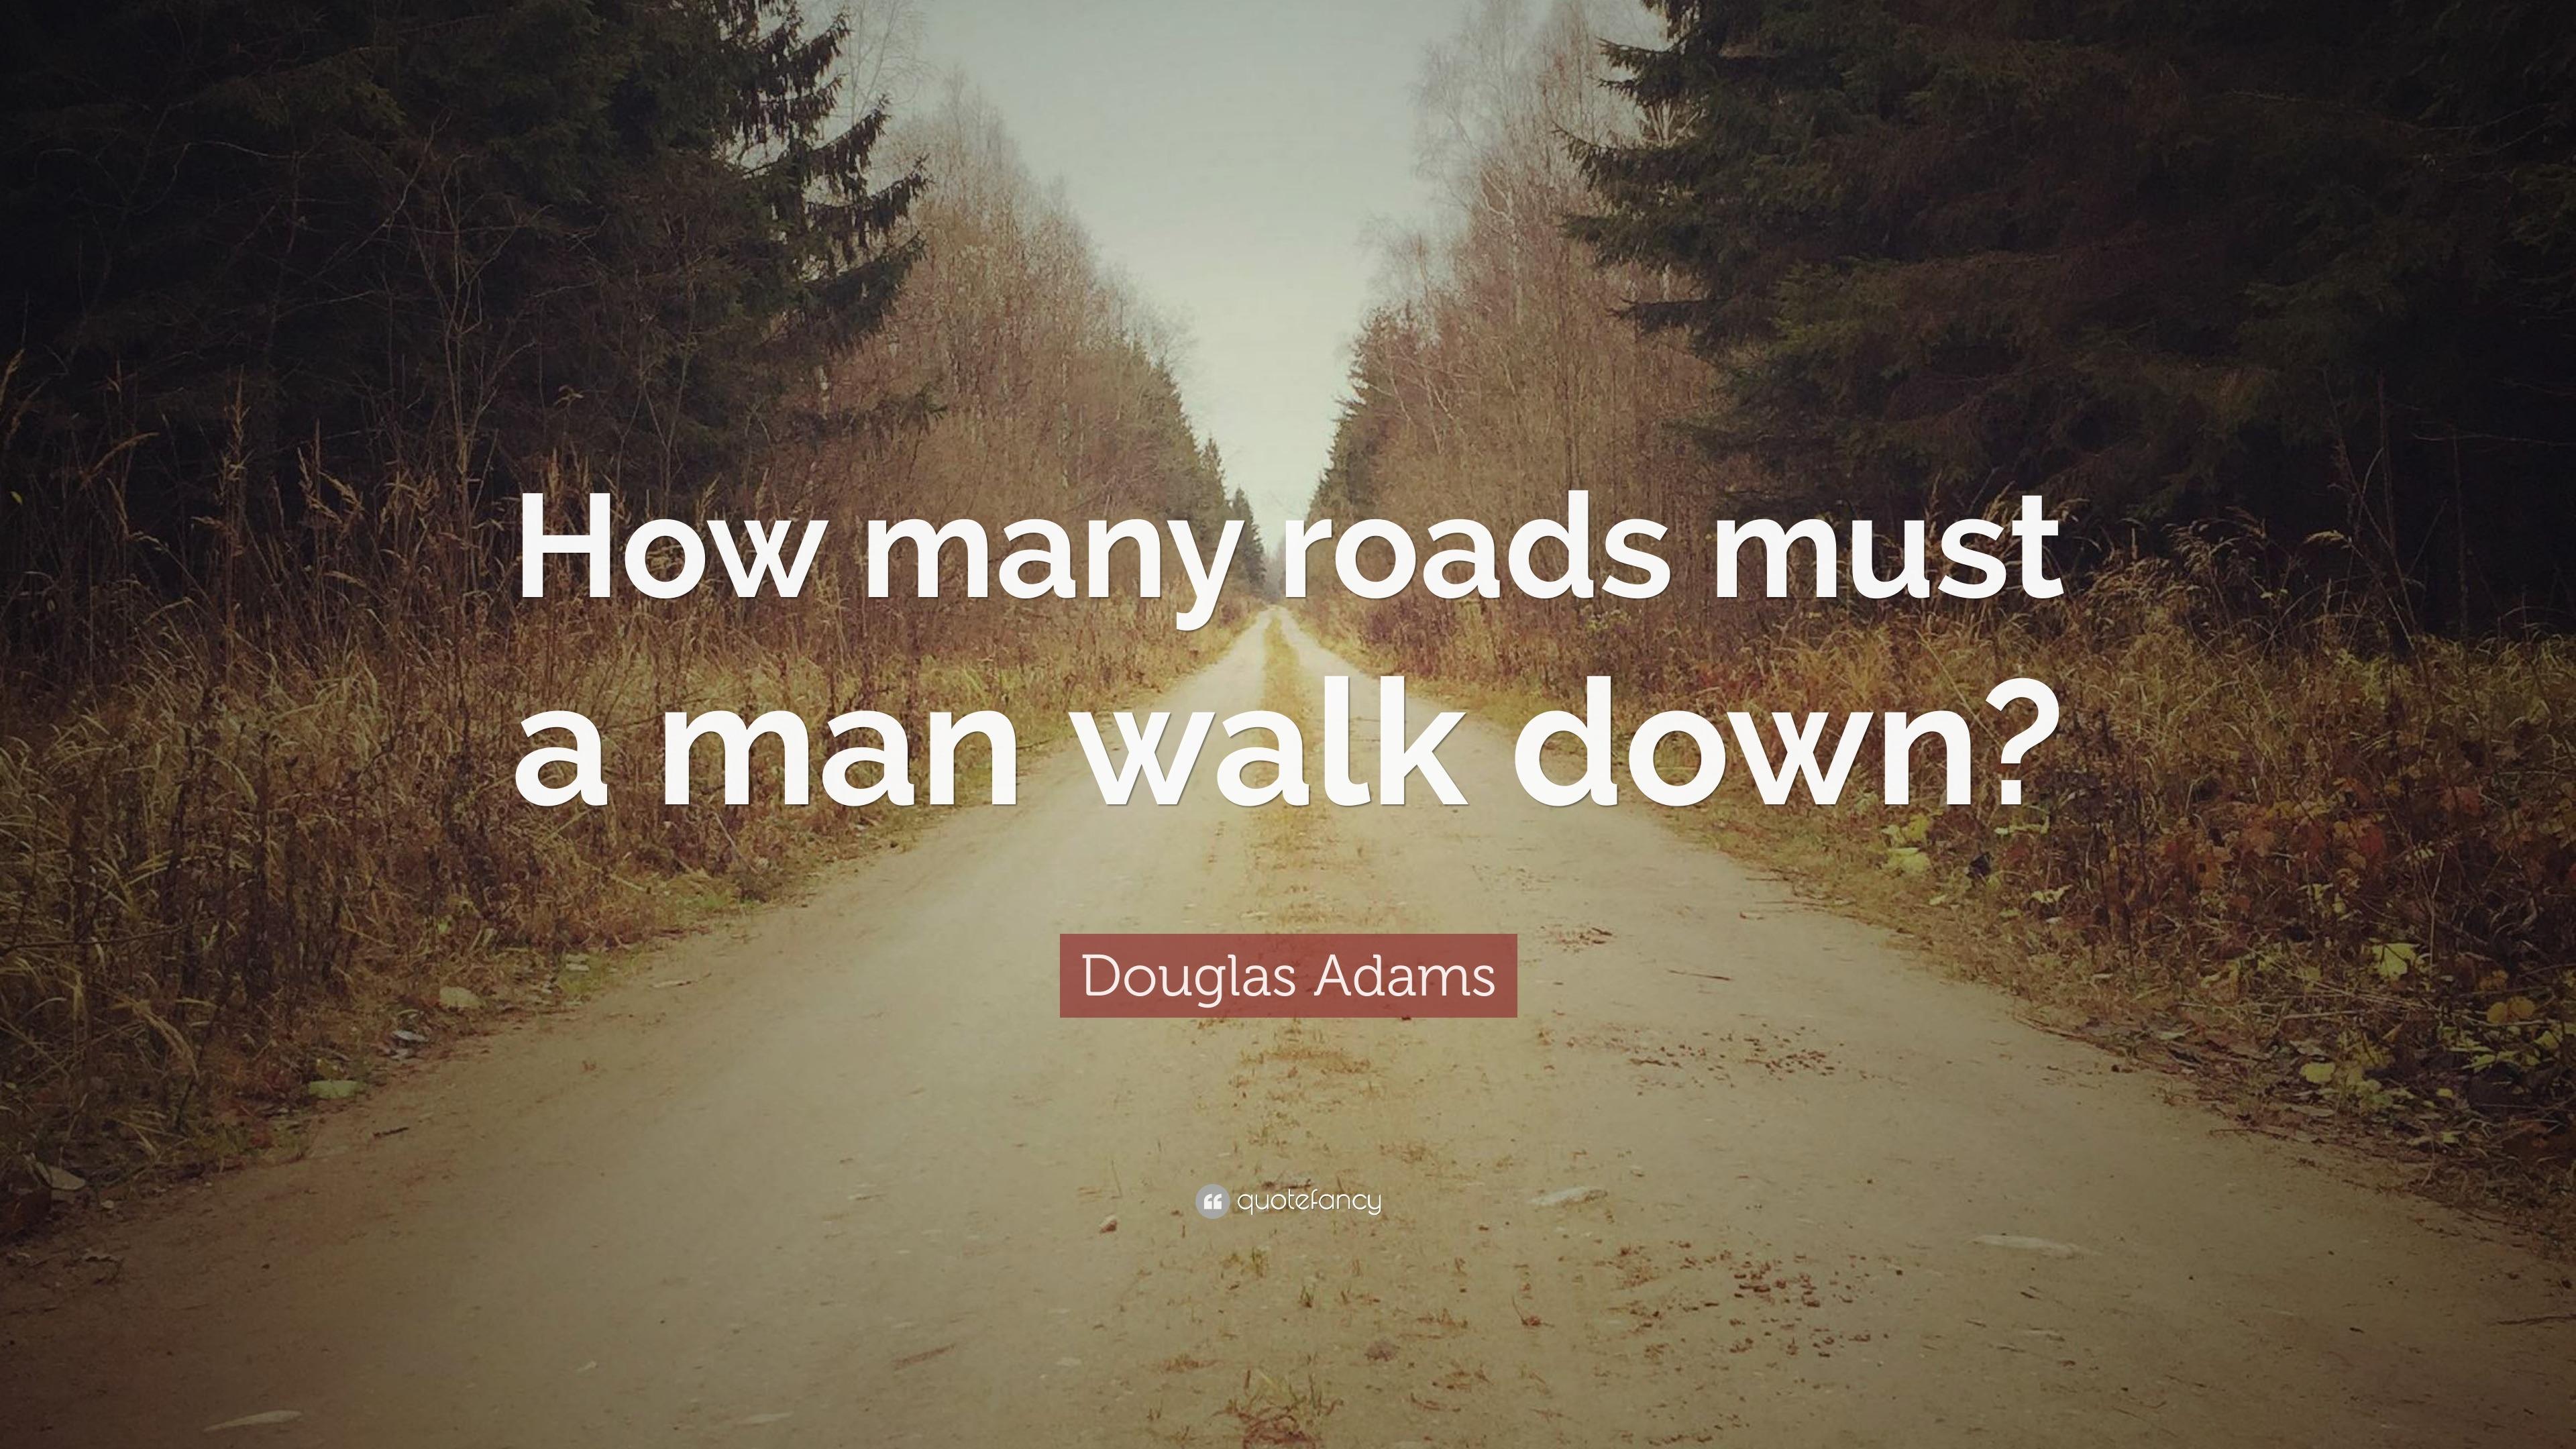 How Many Roads Must a Man Walk Down